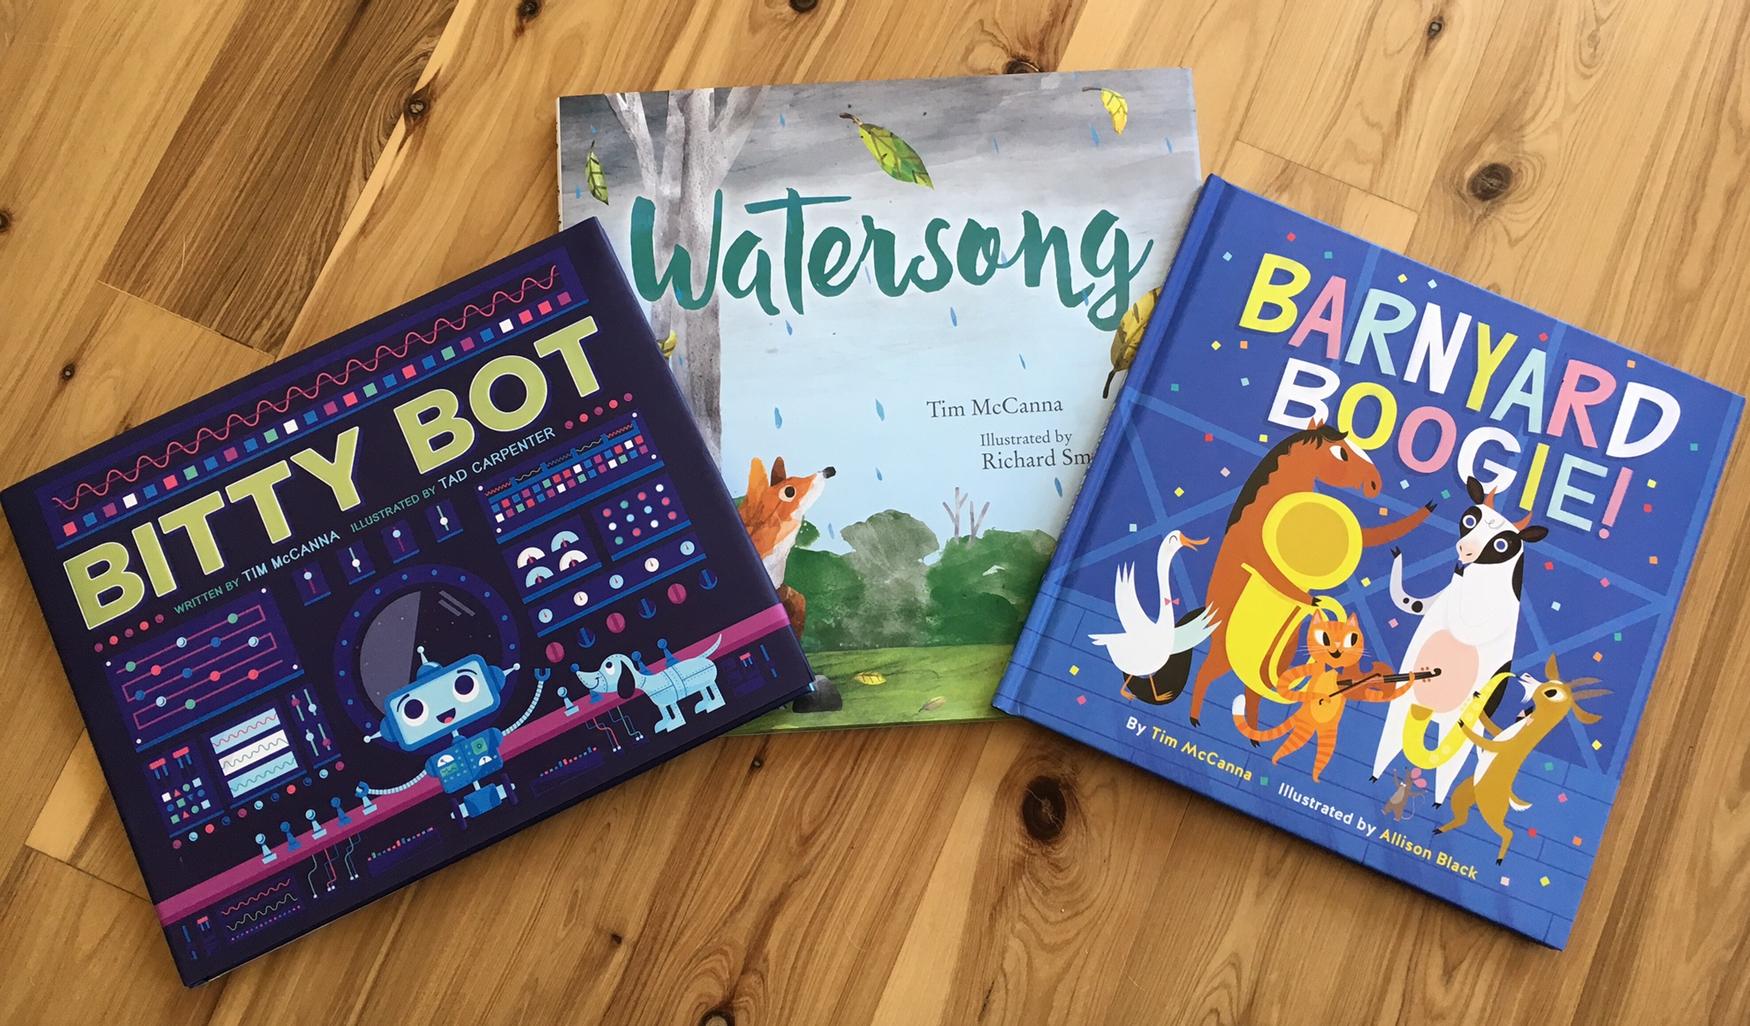 Bitty Bot, Watersong, Barnyard Boogie by Tim McCanna